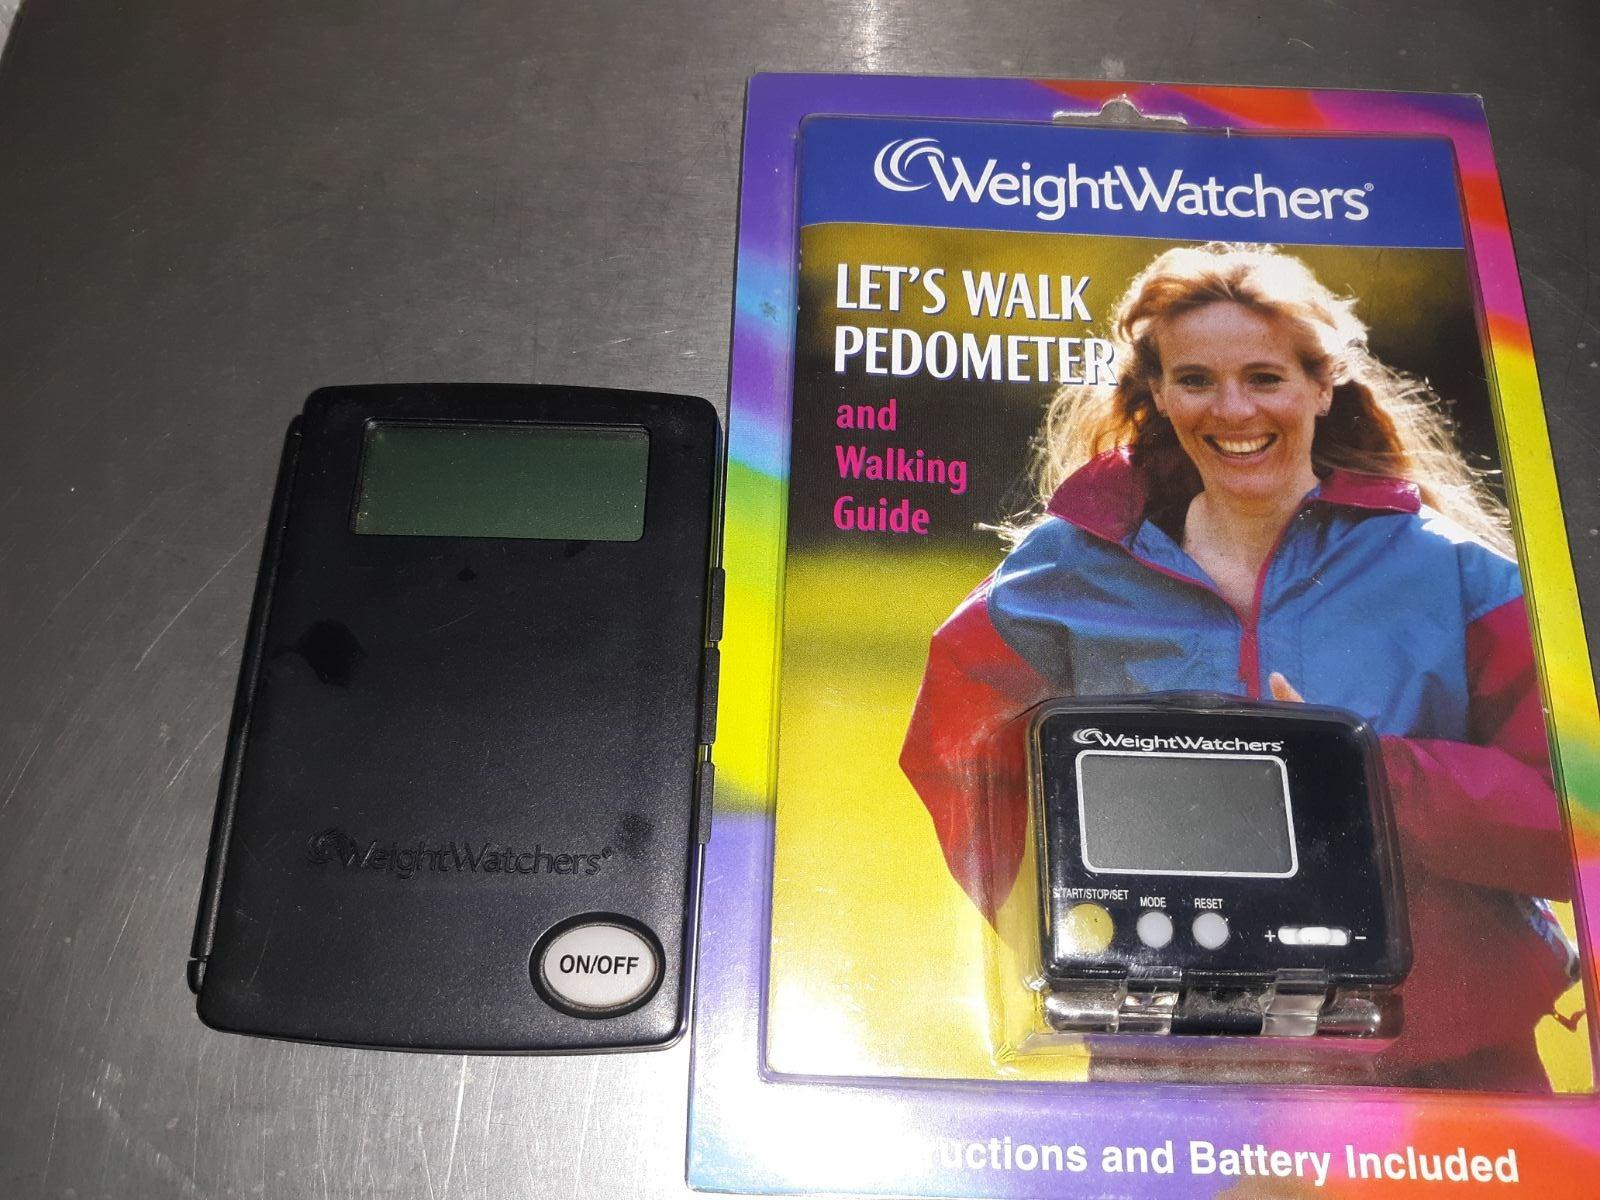 Weight Watchers Pedometer and Calculator